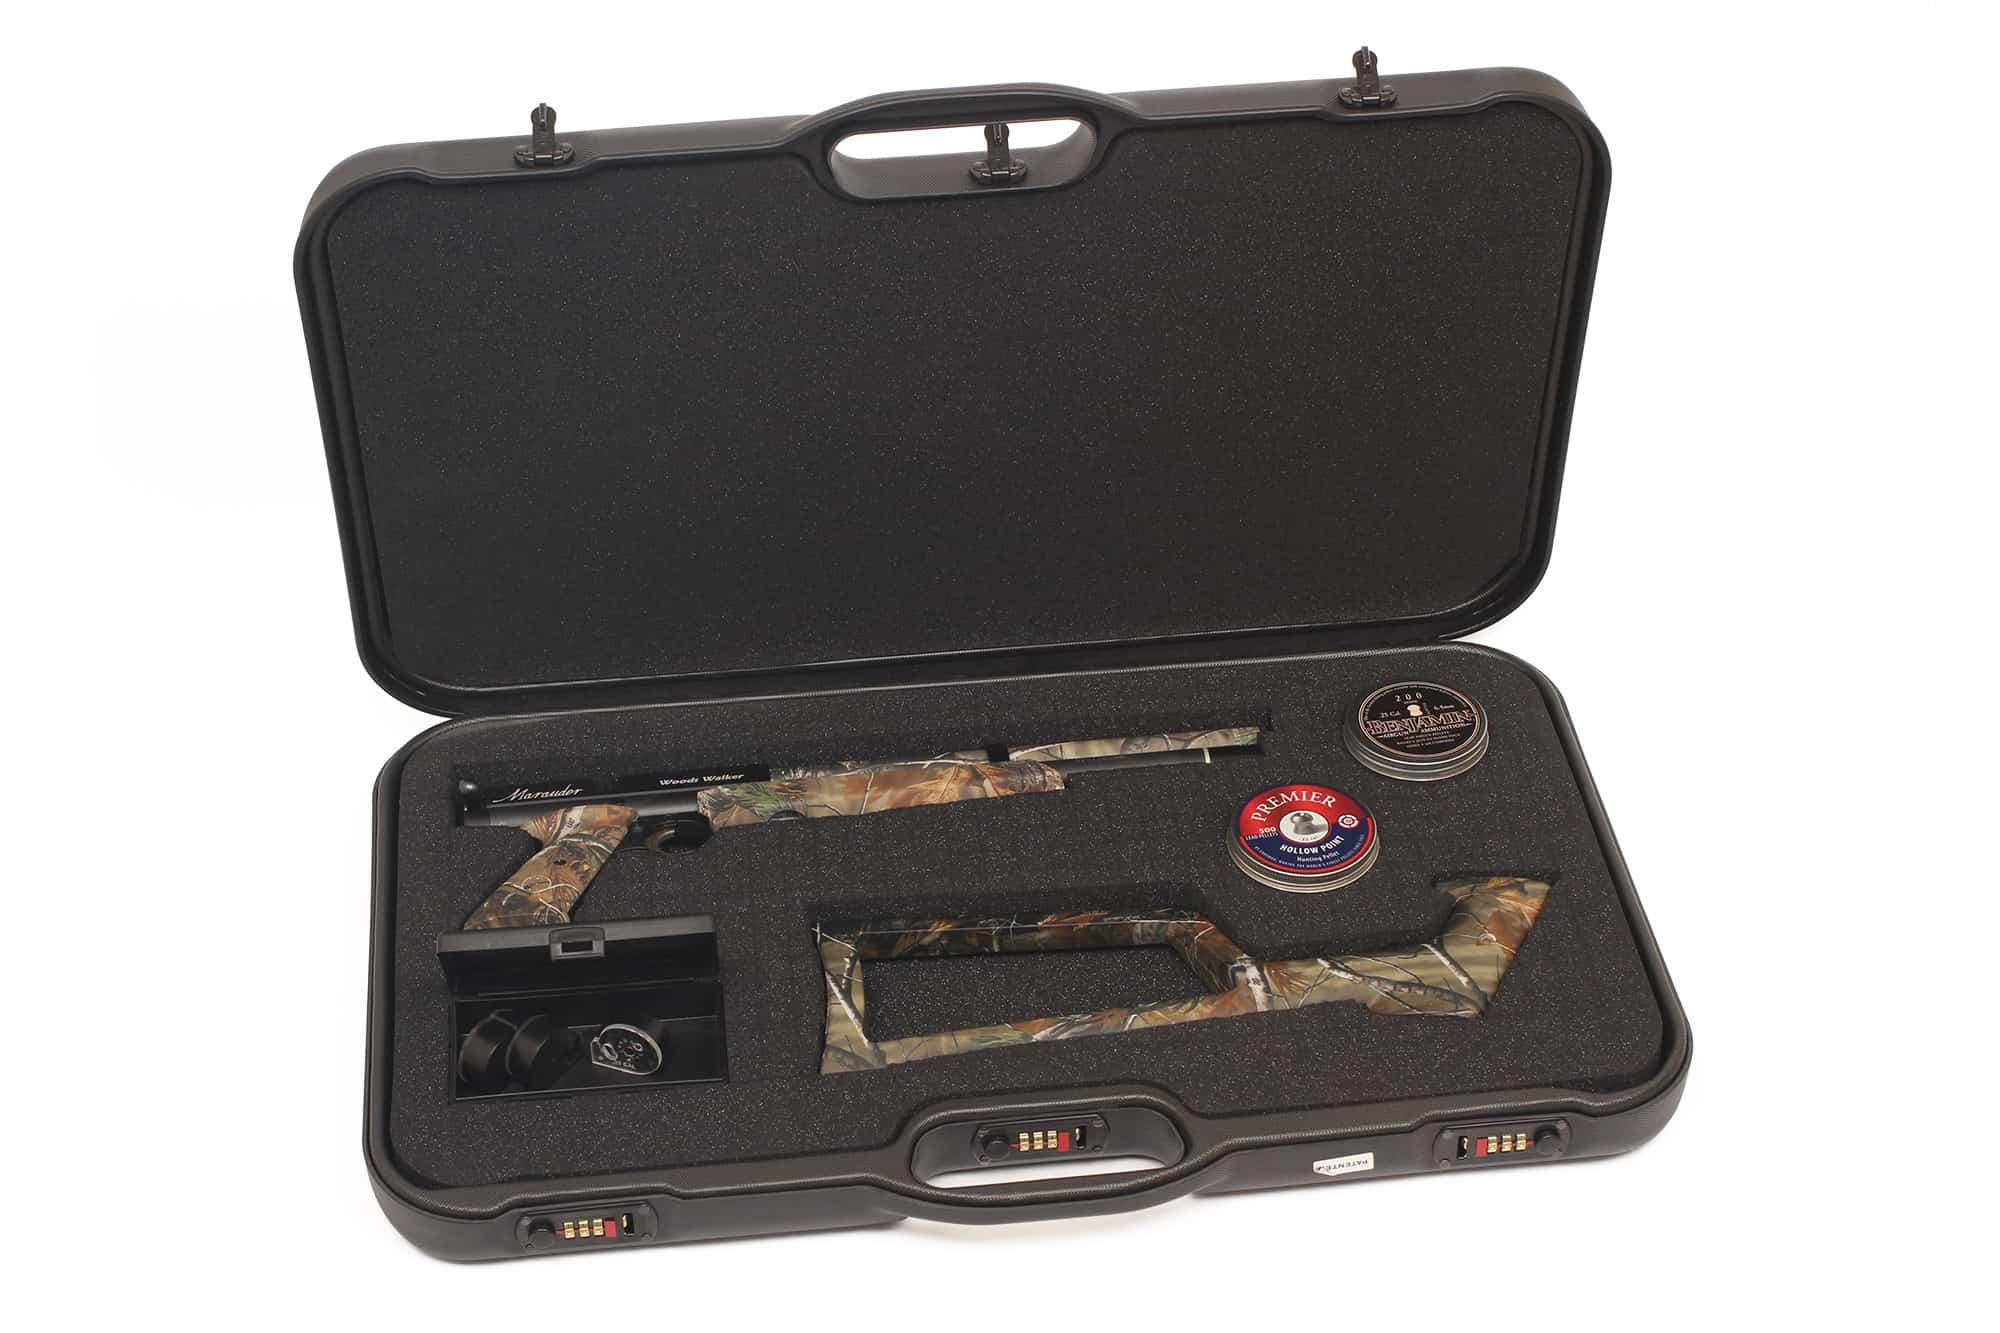 Negrini handgun cases or airgun cases for Case modello artigiano